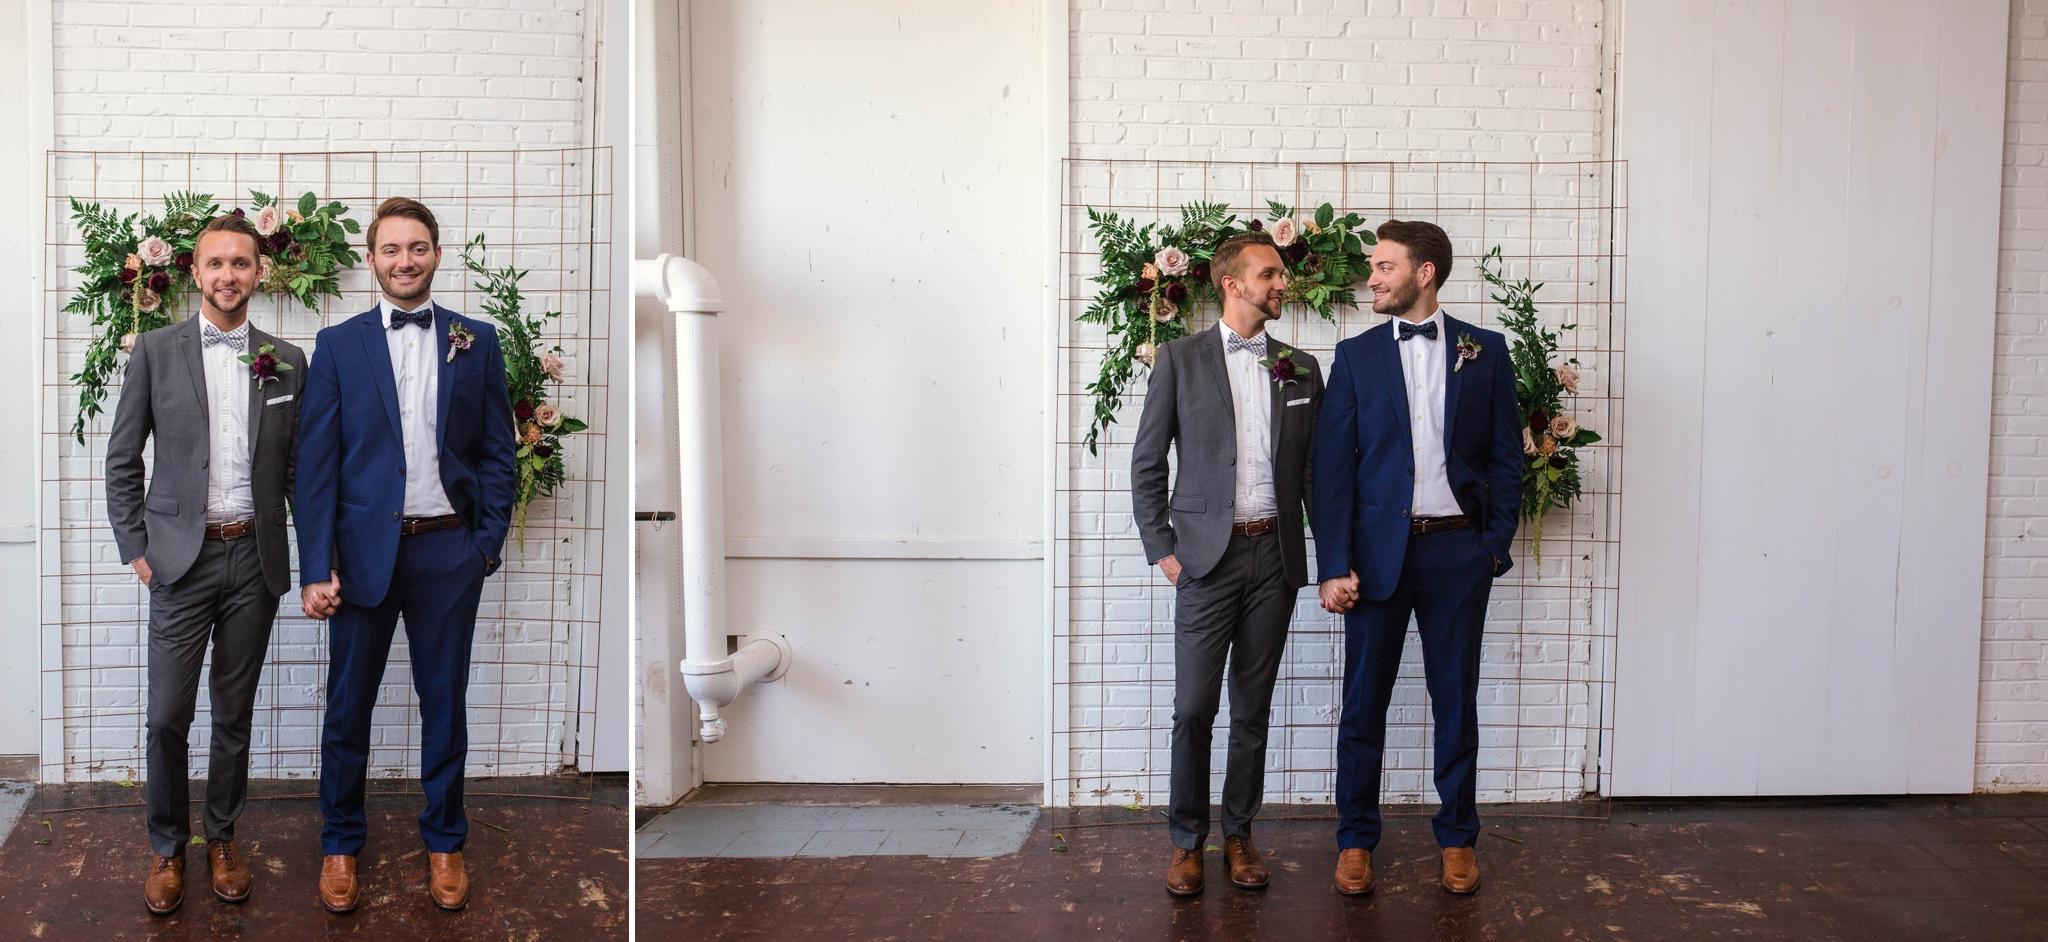 Gay and Lesbian friendly Wedding Photographer in Raleigh North Carolina - Johanna Dye Photography 6.jpg